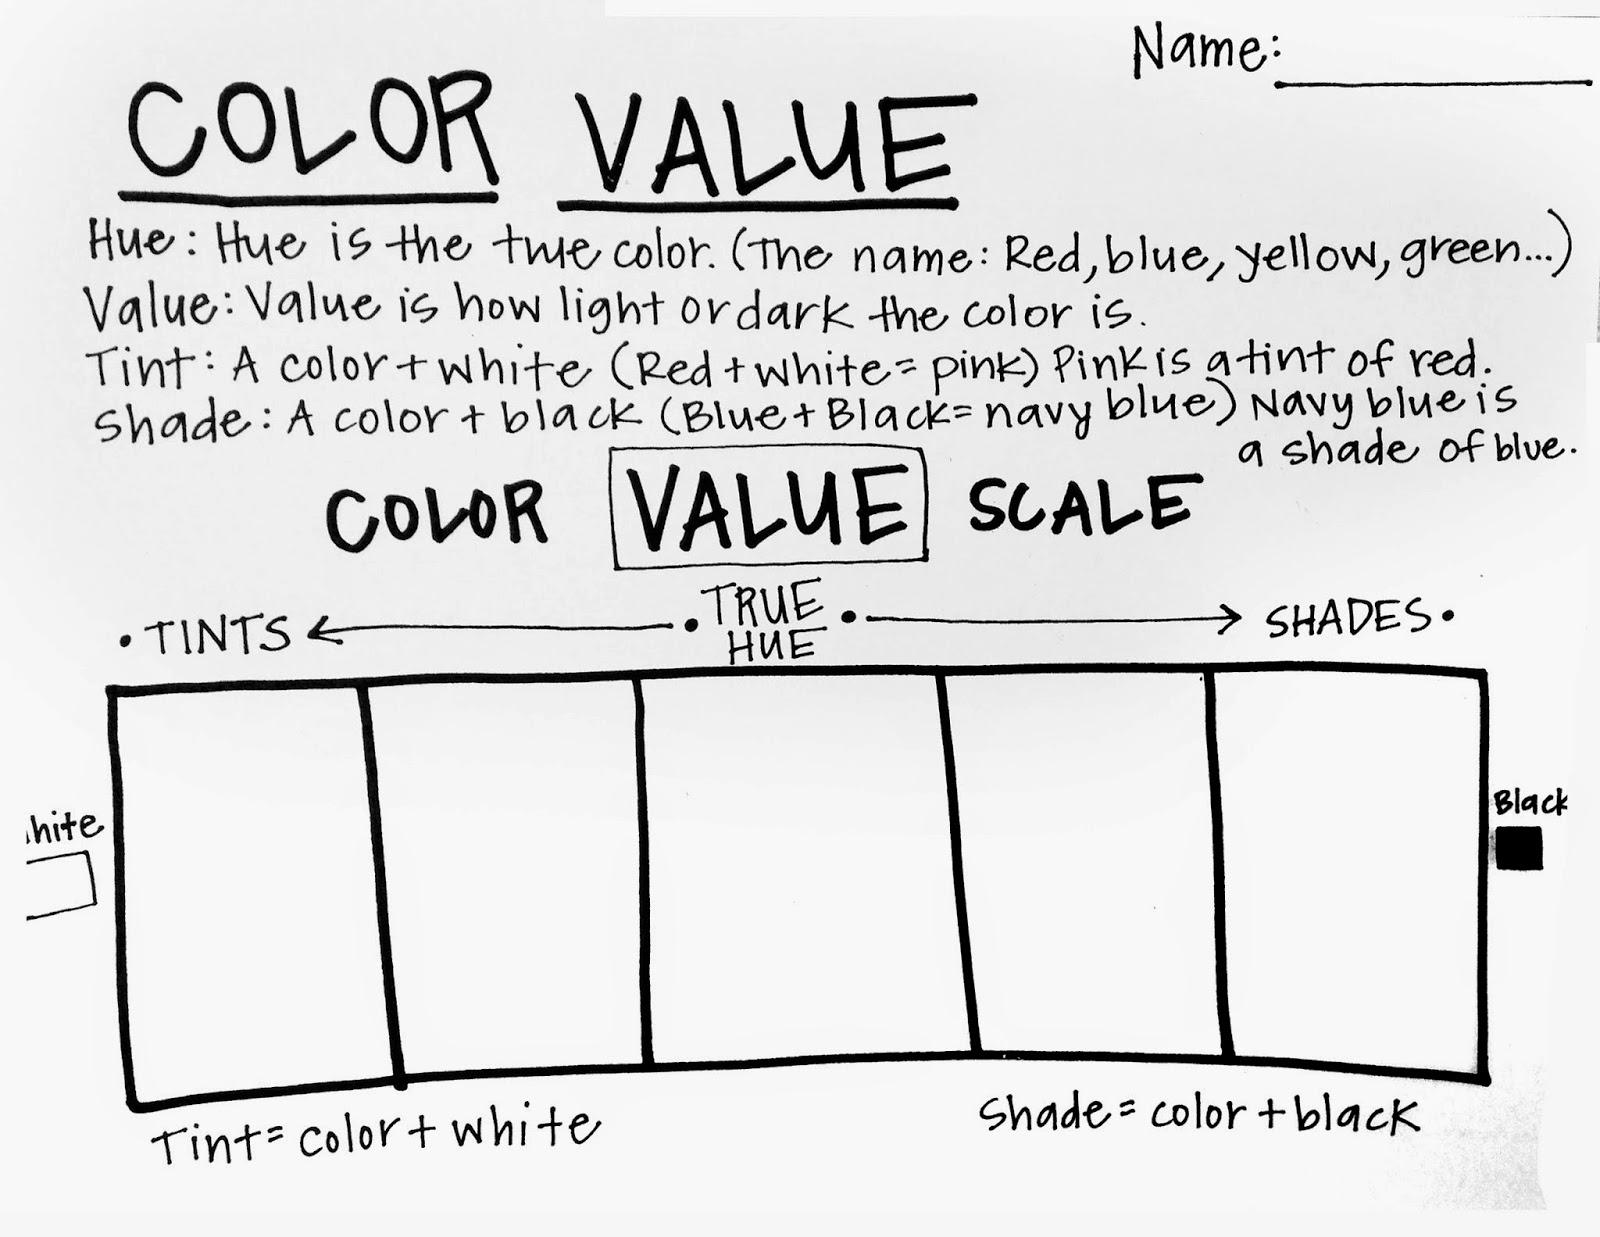 Value scale and sphere worksheet; blending value